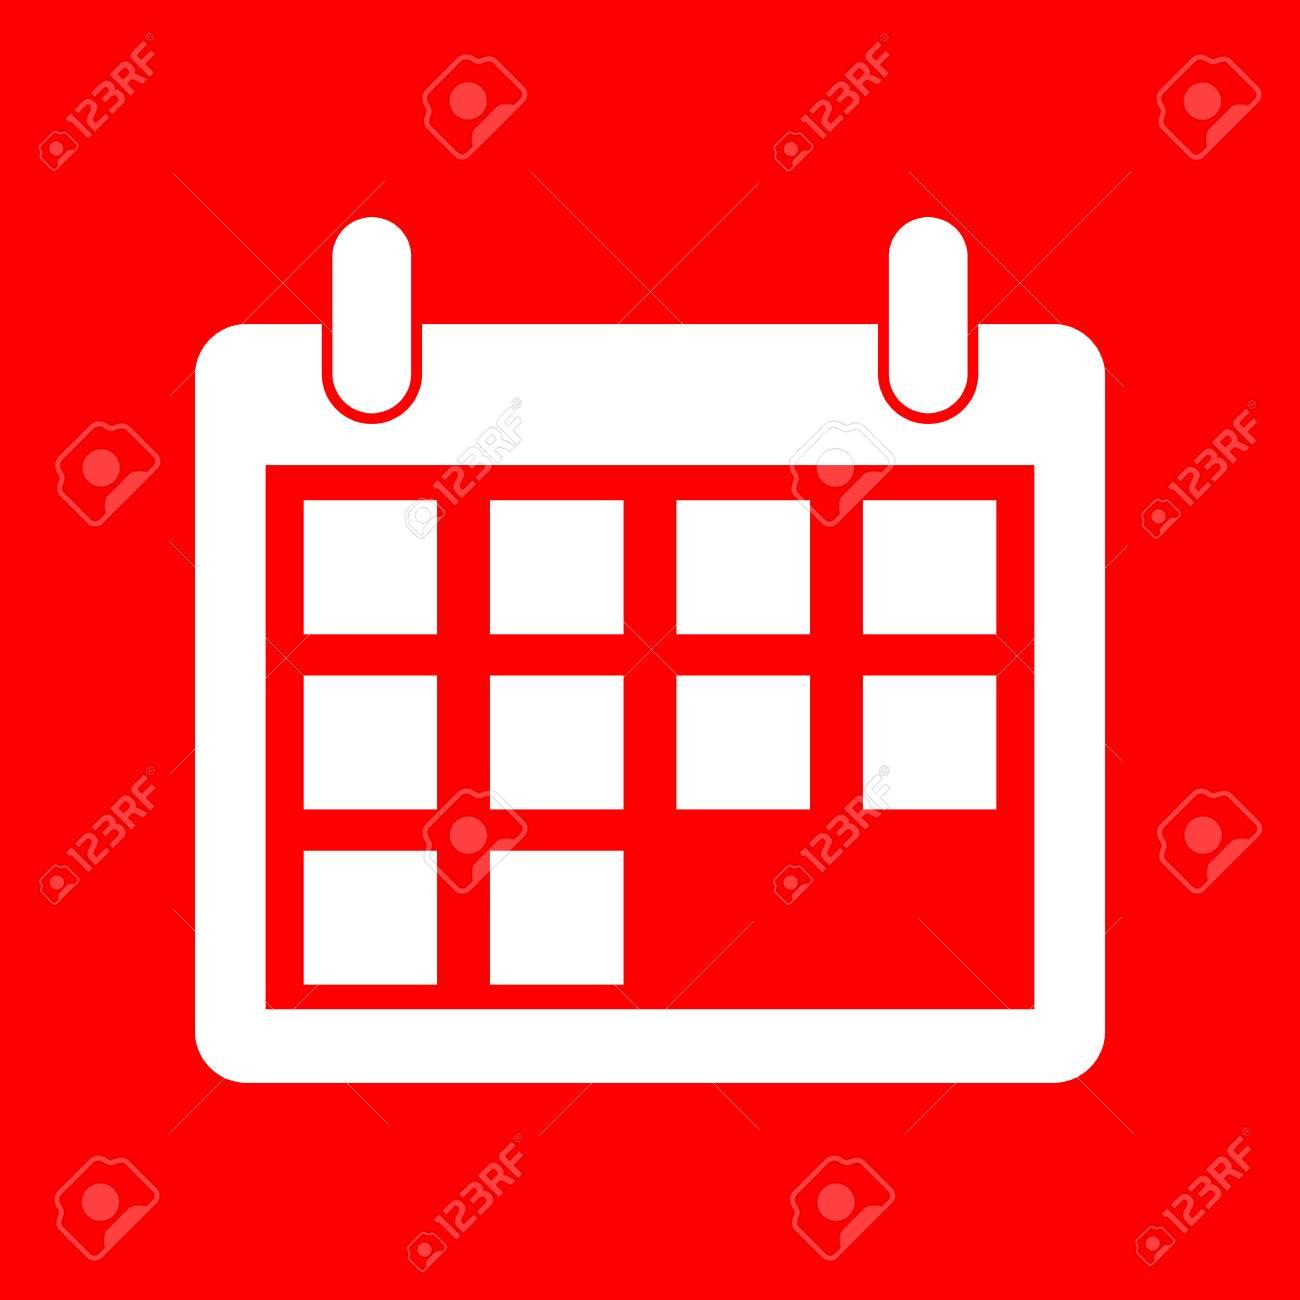 Calendario Vector Blanco.Calendar Sign Illustration White Icon On Red Background